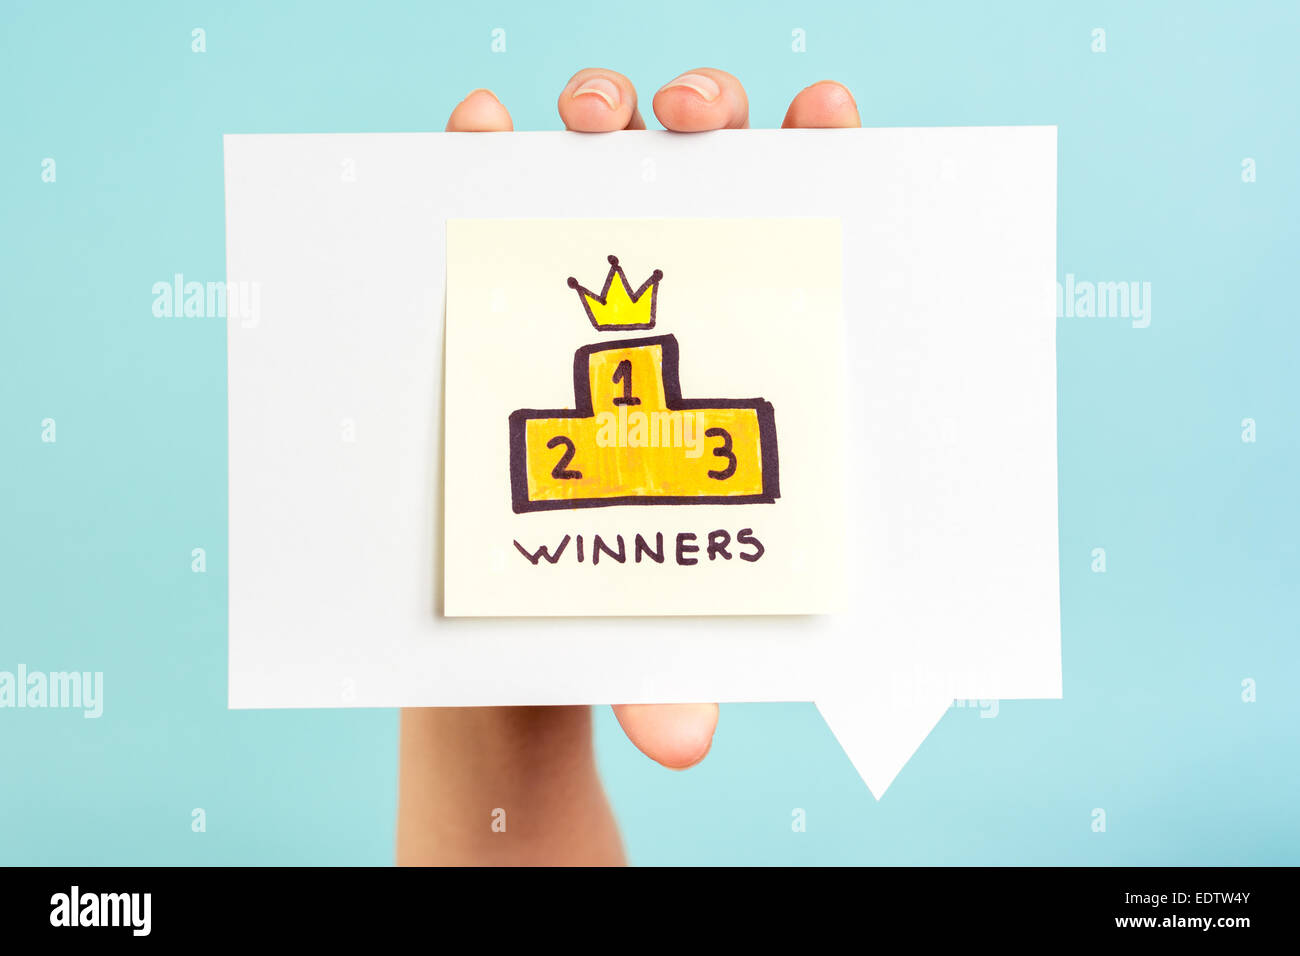 Winners podium message on blue background - Stock Image